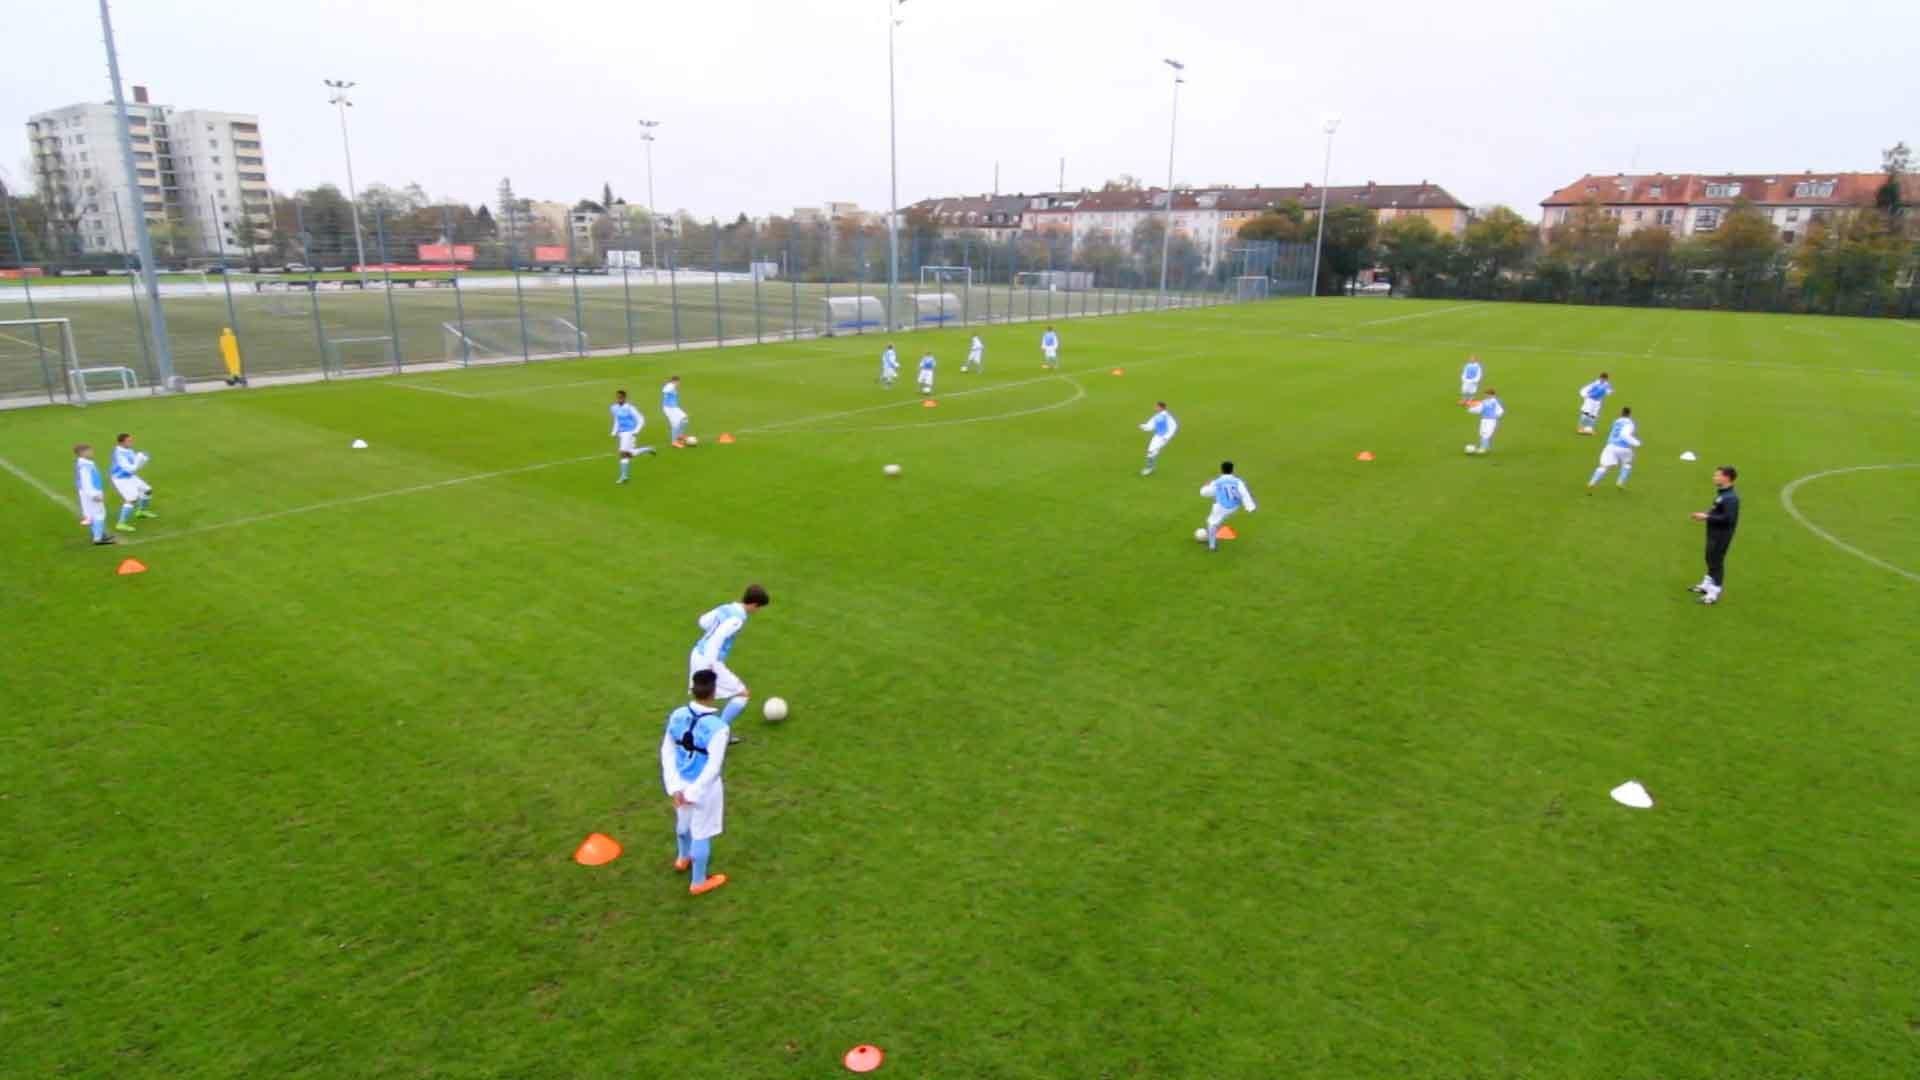 Ballschule: Pendel